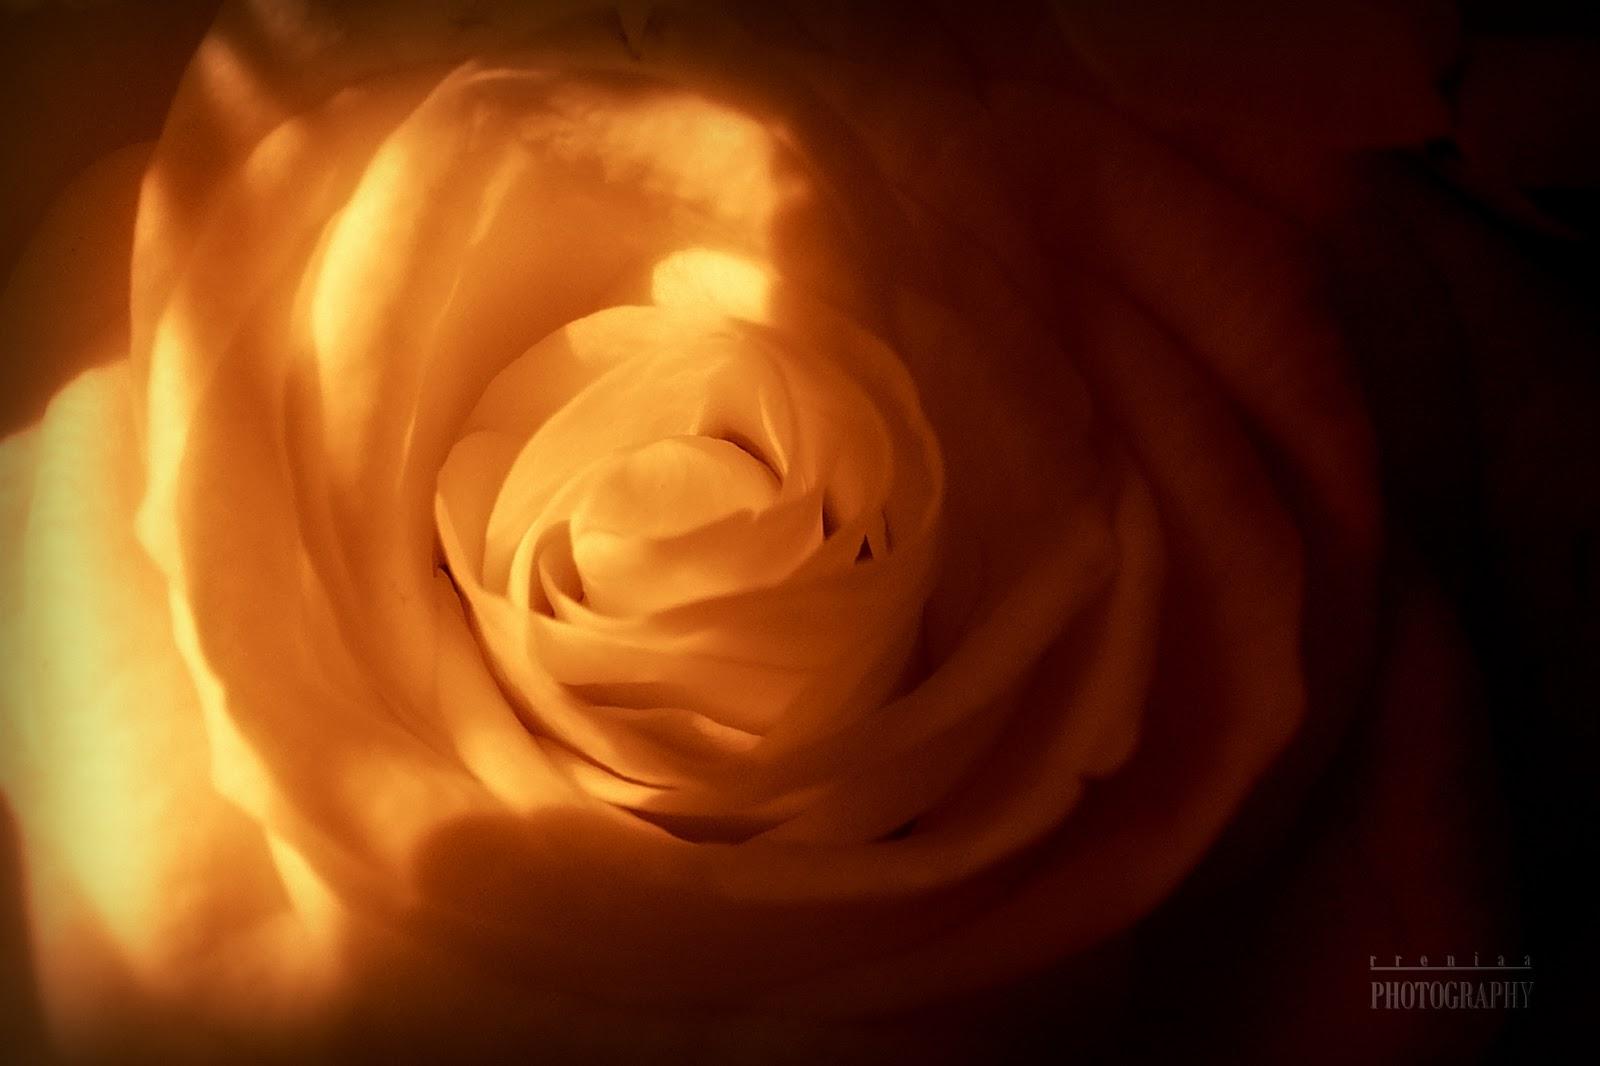 rreniaaphotography, róże, roses